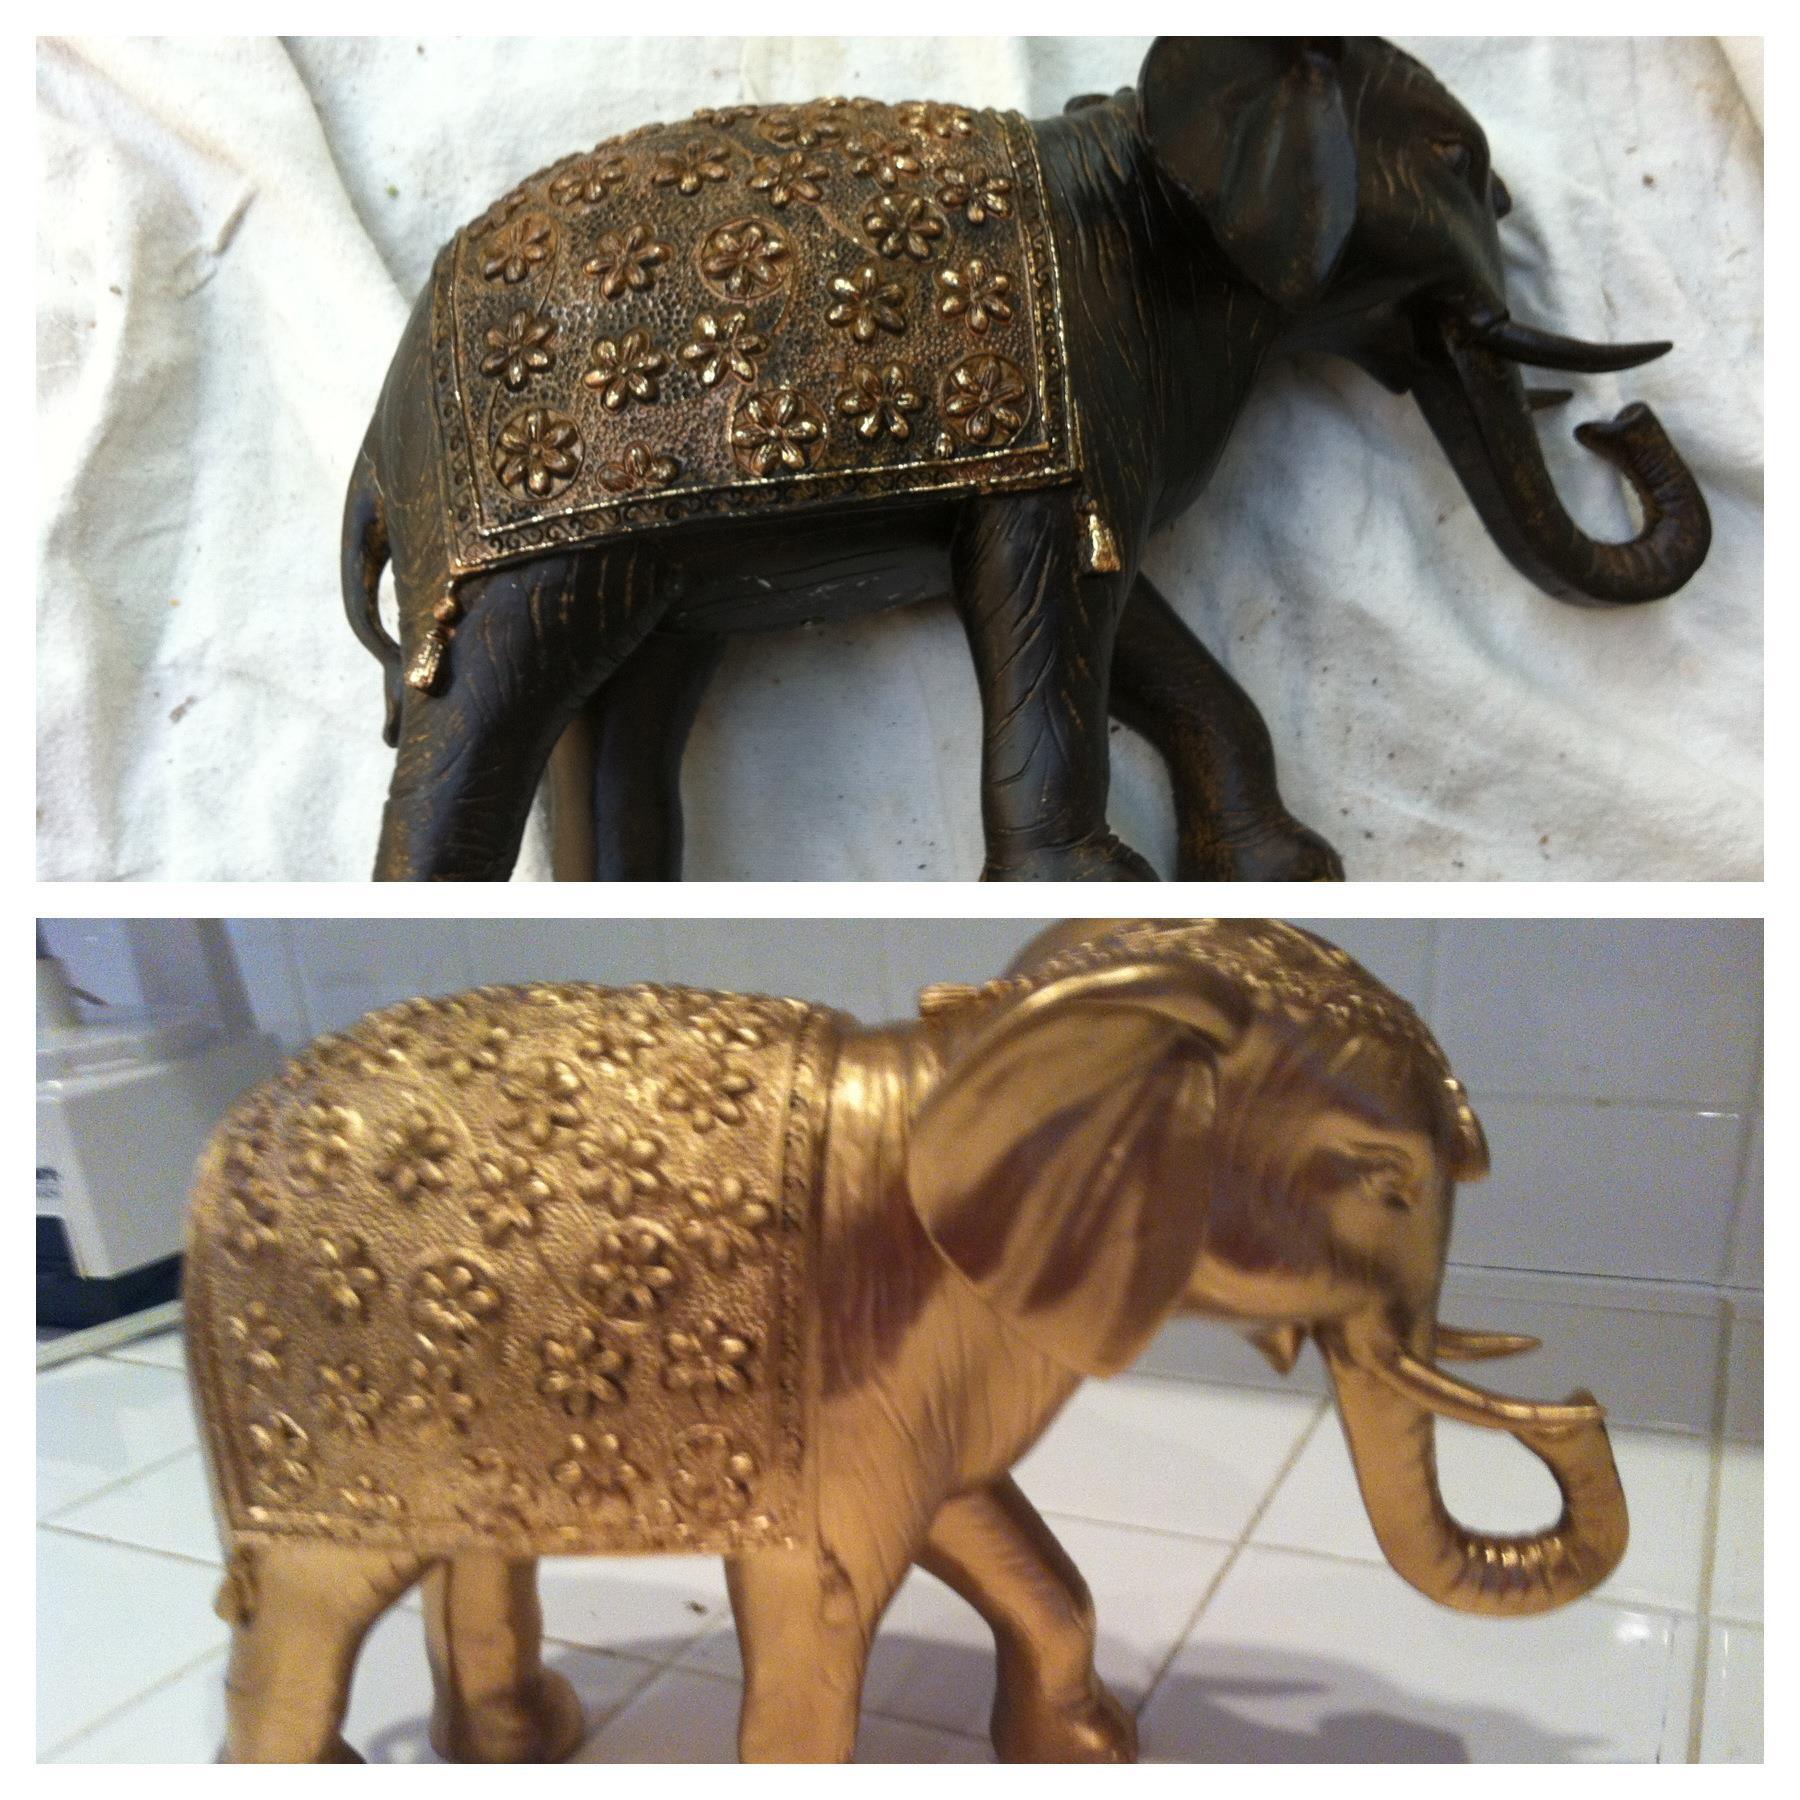 Elephant statue DIY